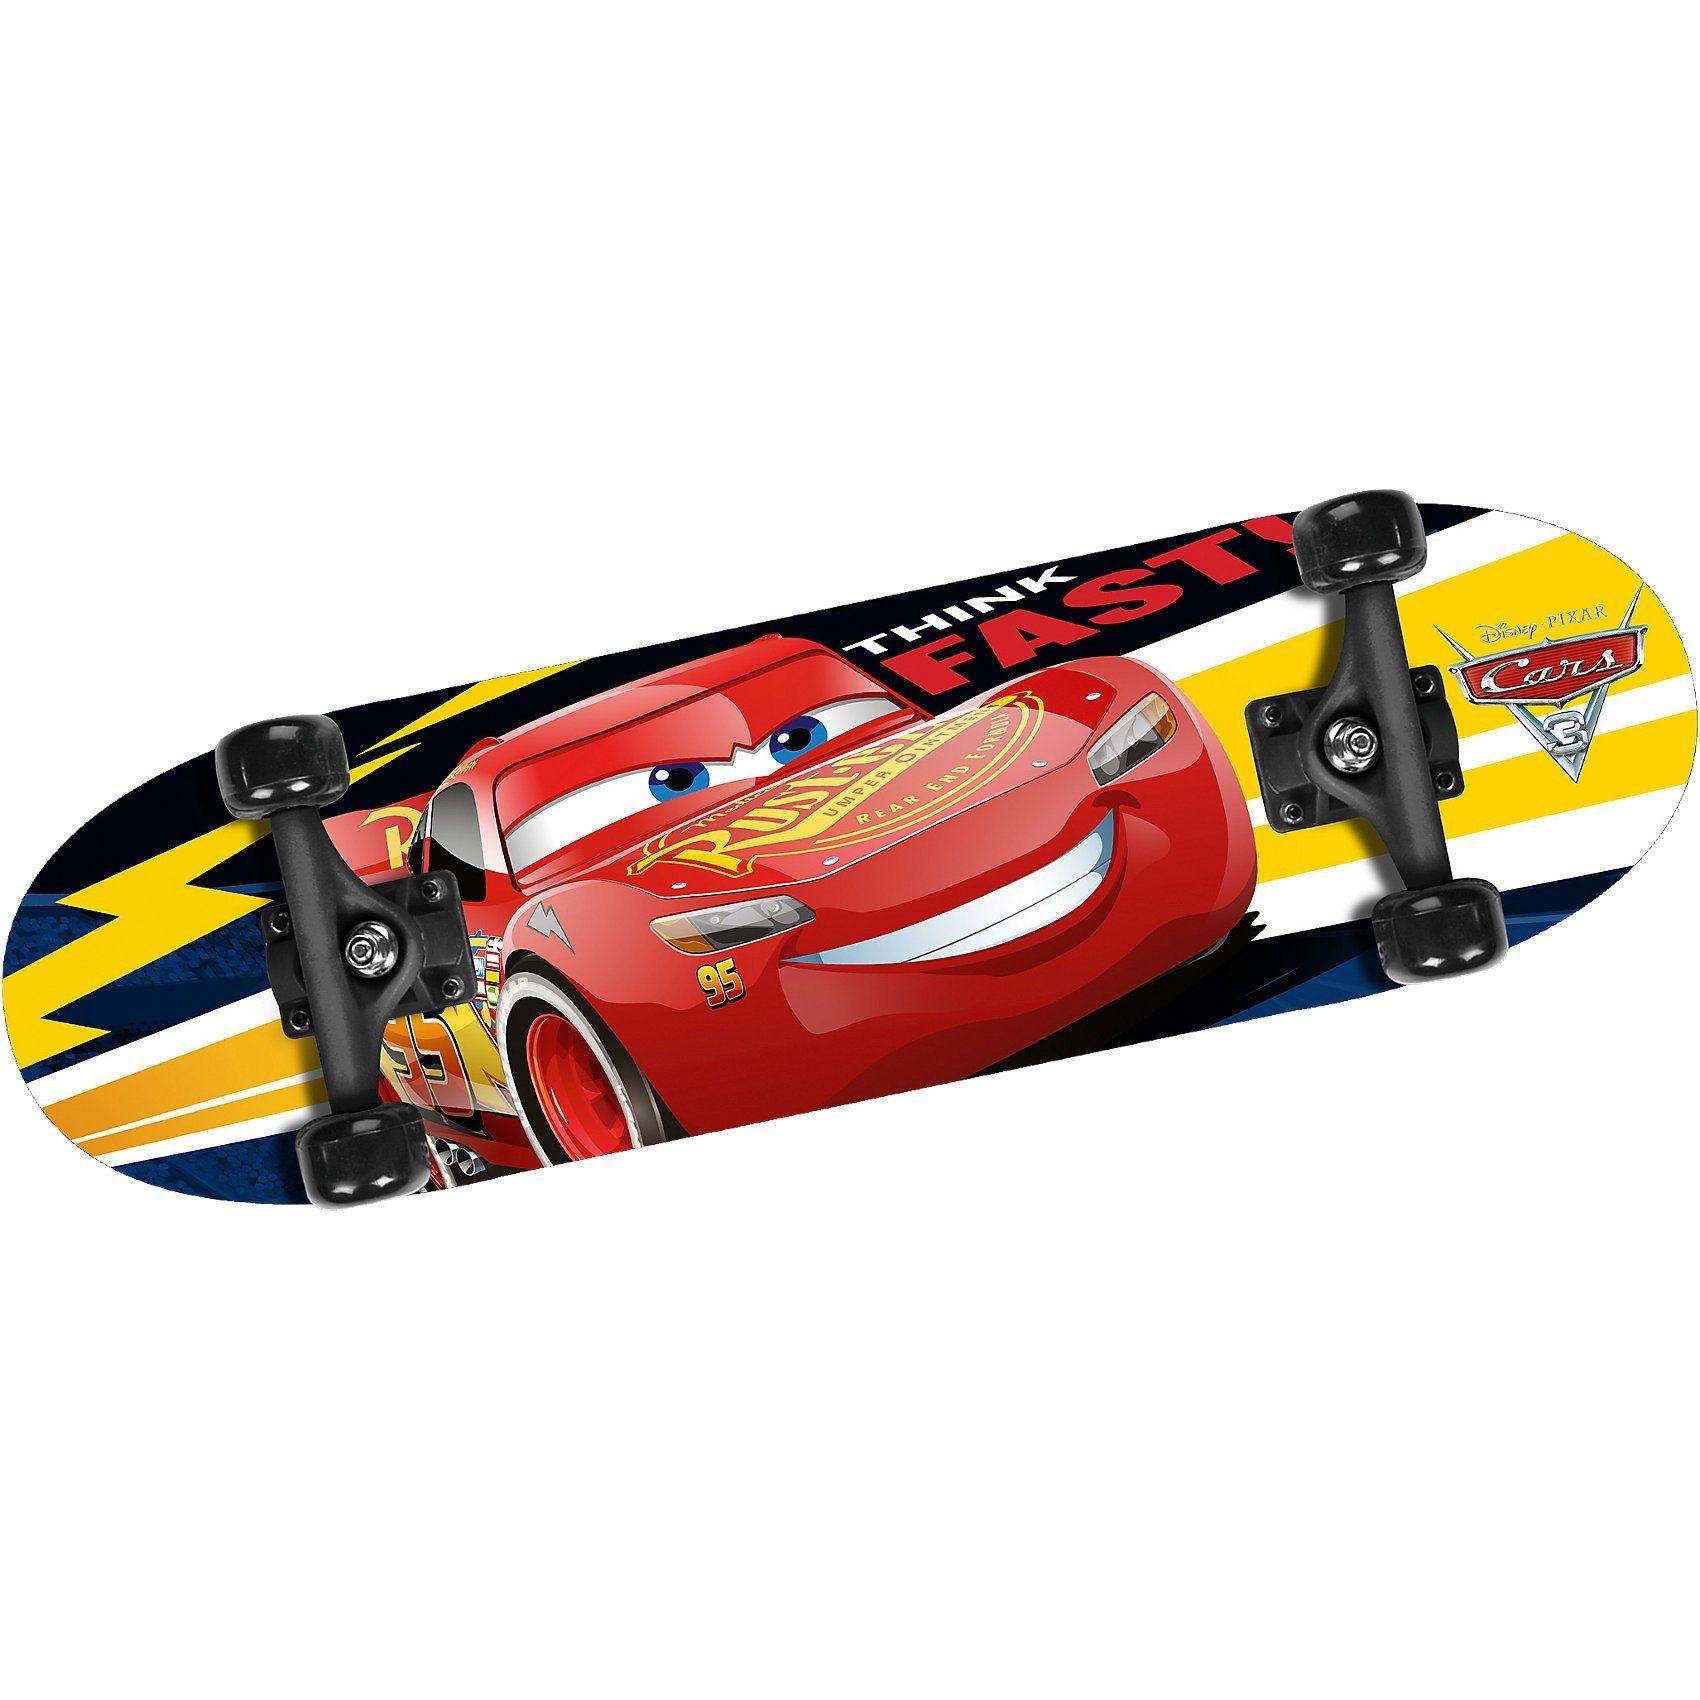 STAMP Cars Skateboard